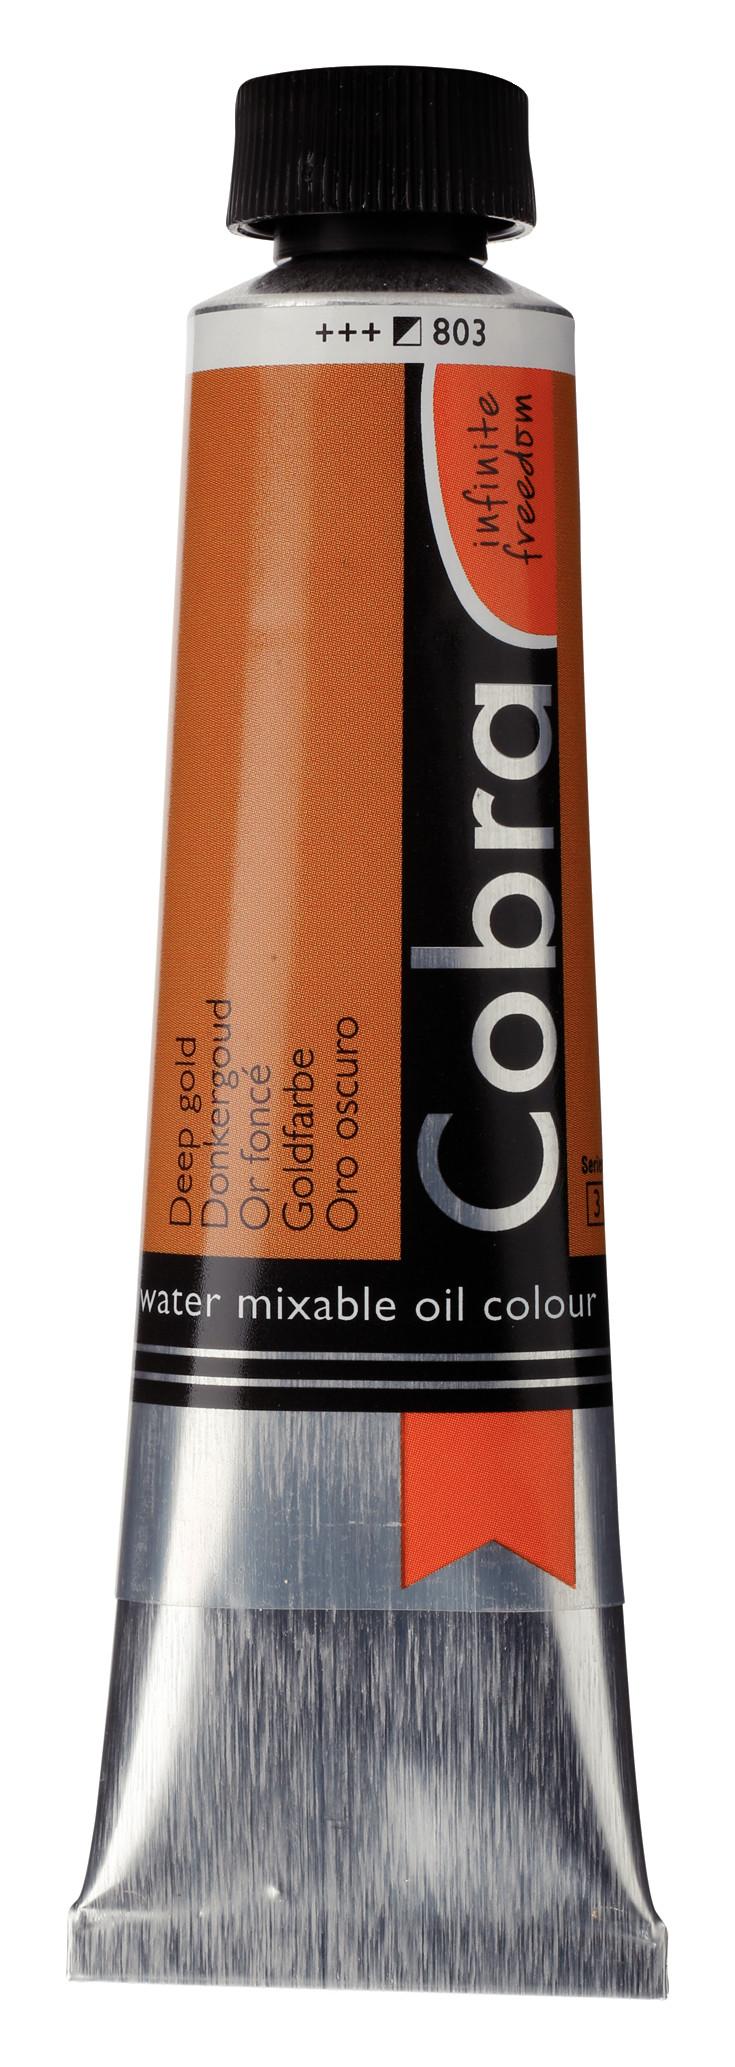 Cobra Artist Water Mixable Oil Colour Tube 40 ml Deep Gold 803